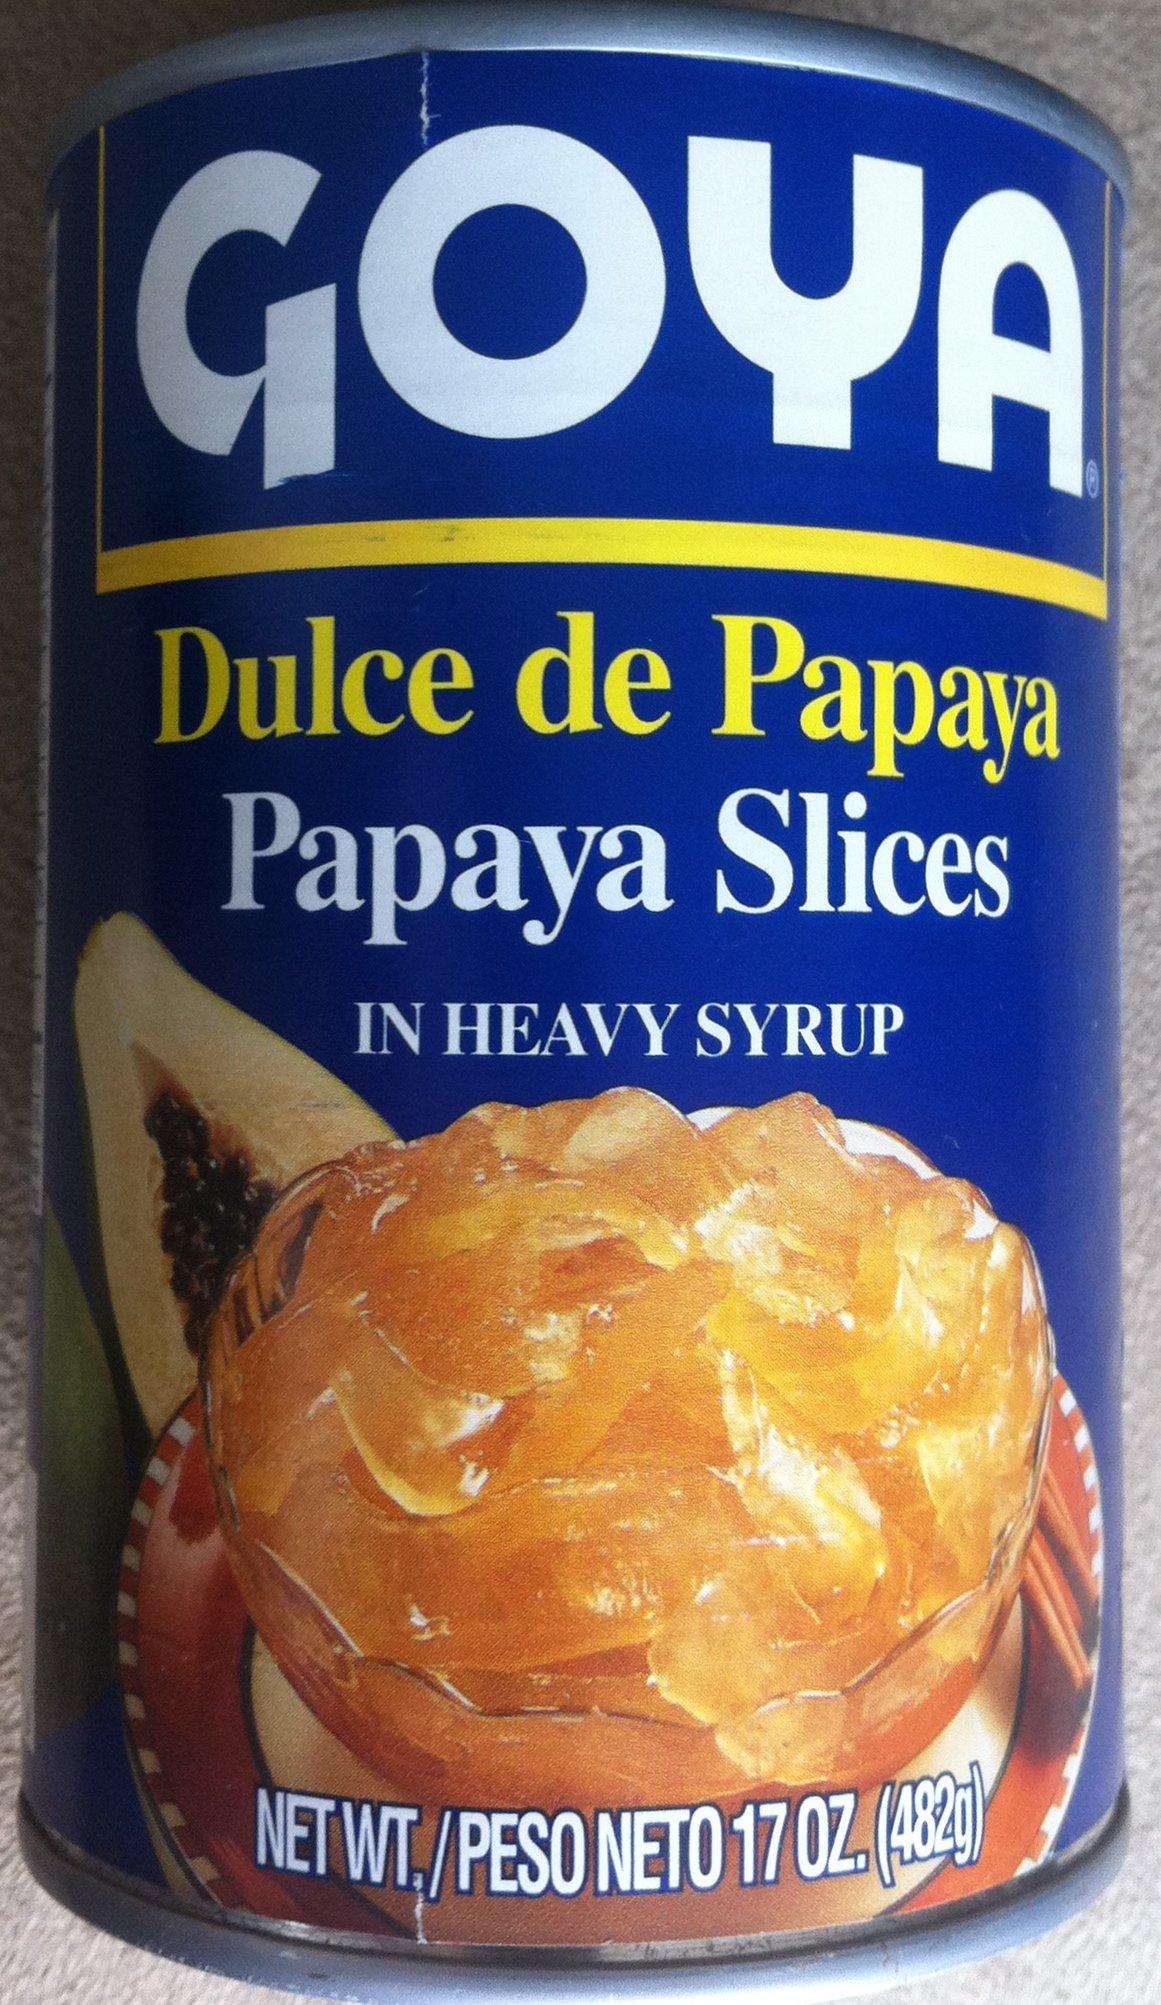 Goya - Dulce de Papaya (Papaya slices in heavy syrup) 4 pack, 17oz each